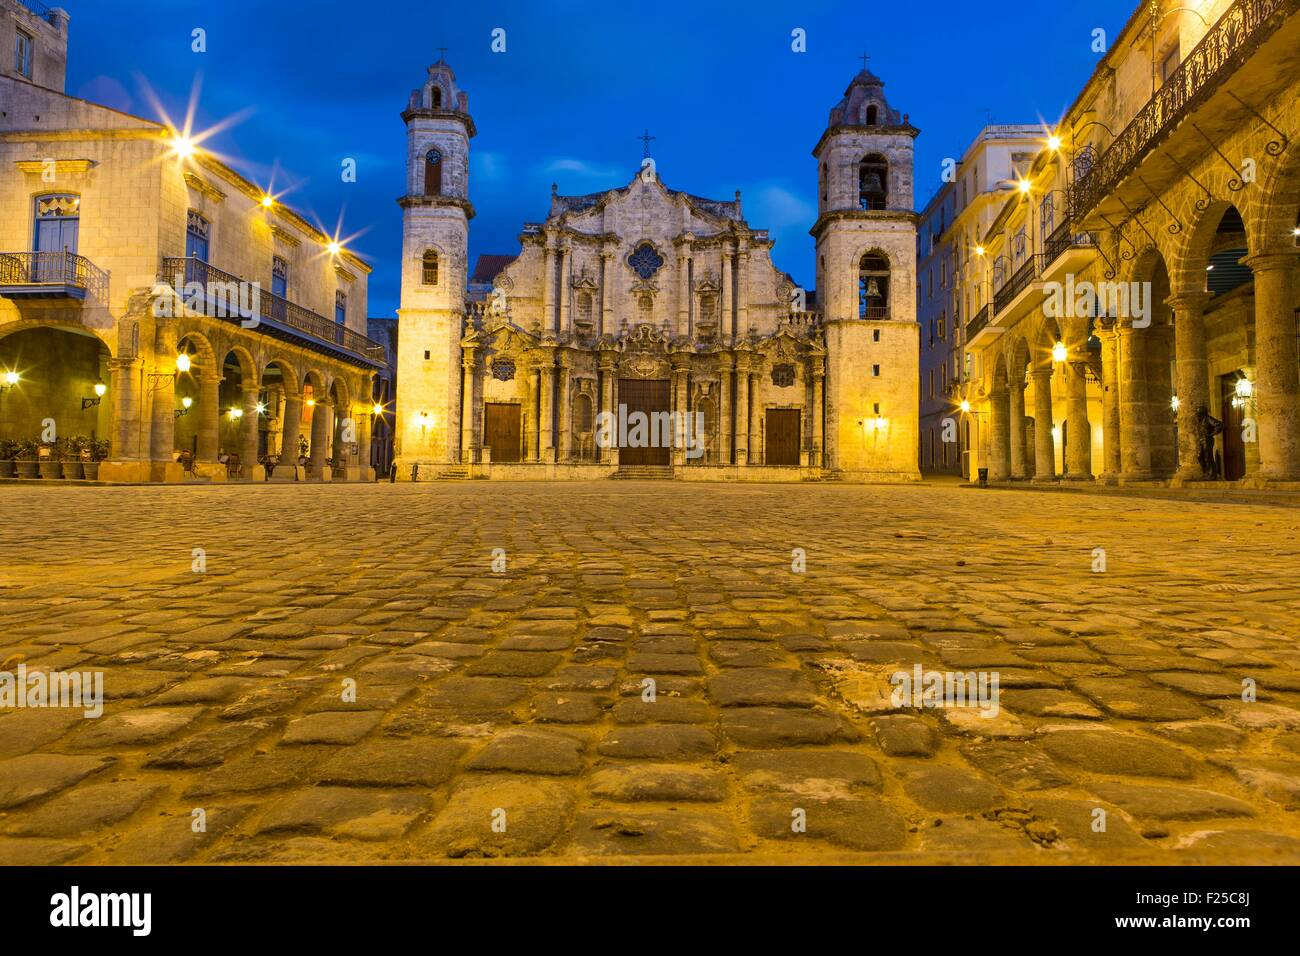 Cuba, Ciudad de la Habana Province, La Havana, La Habana Vieja district elencati come patrimonio mondiale, la piazza Immagini Stock